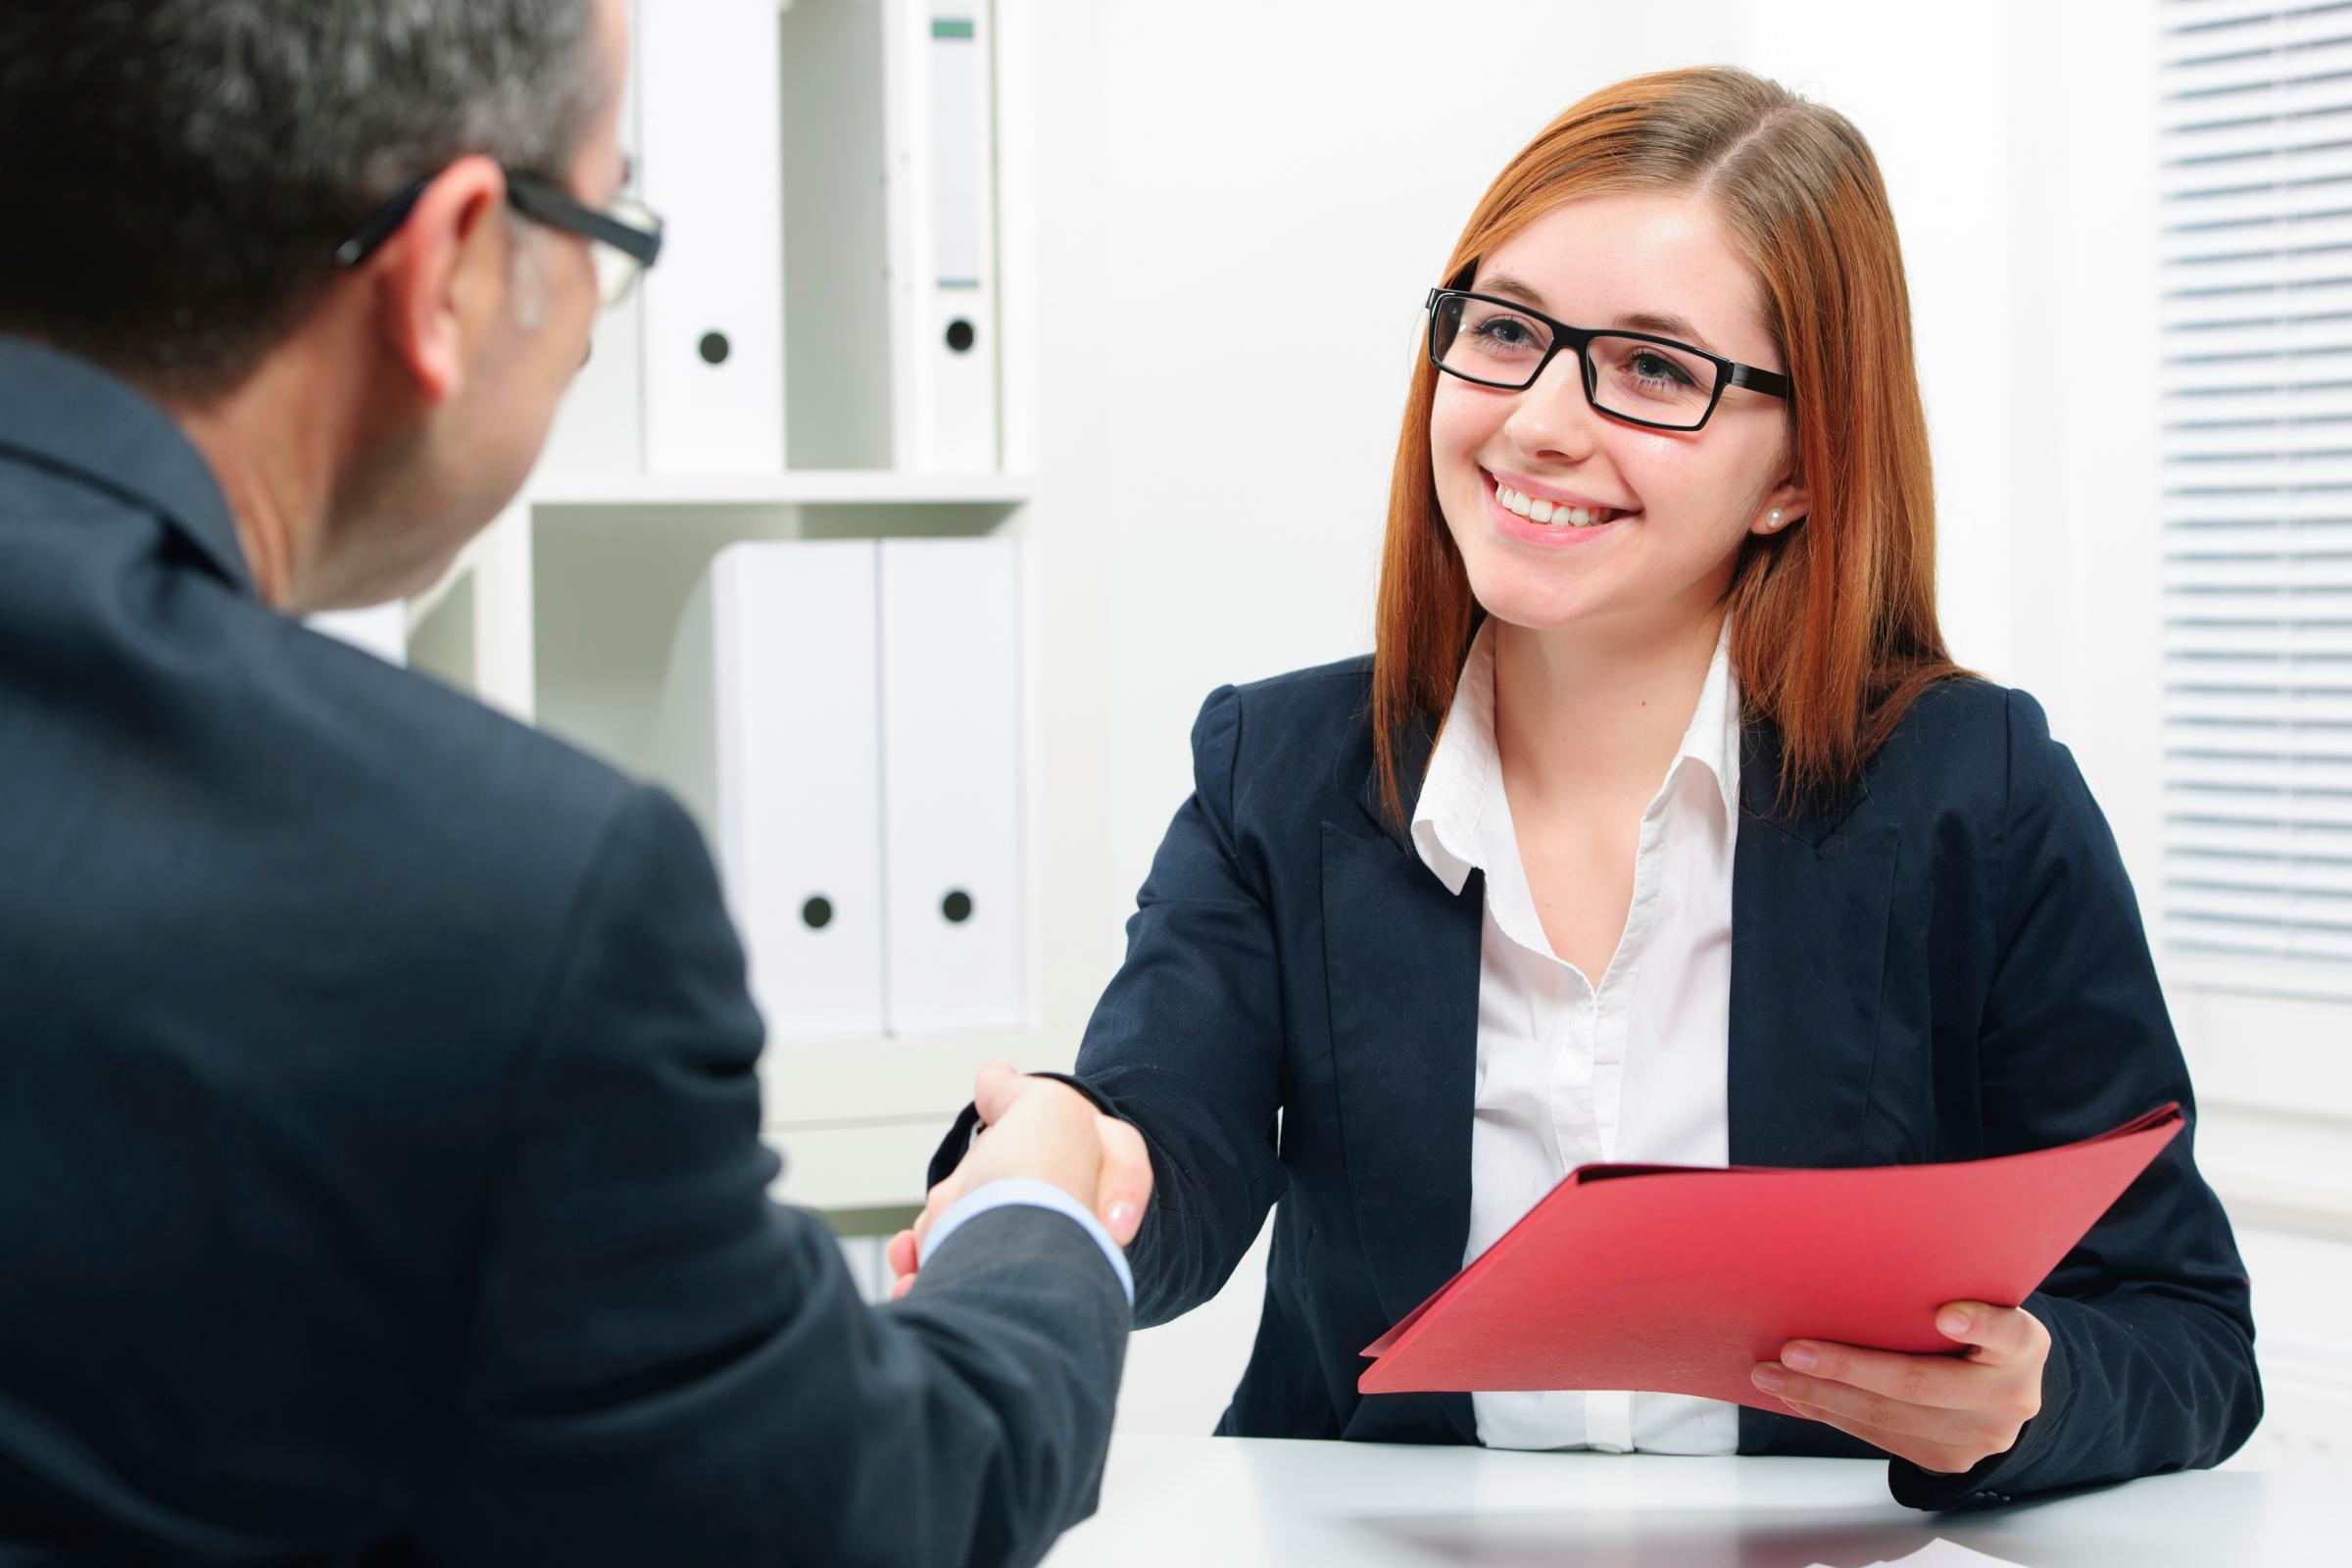 Рекомендации Правила Знакомства В Офисе